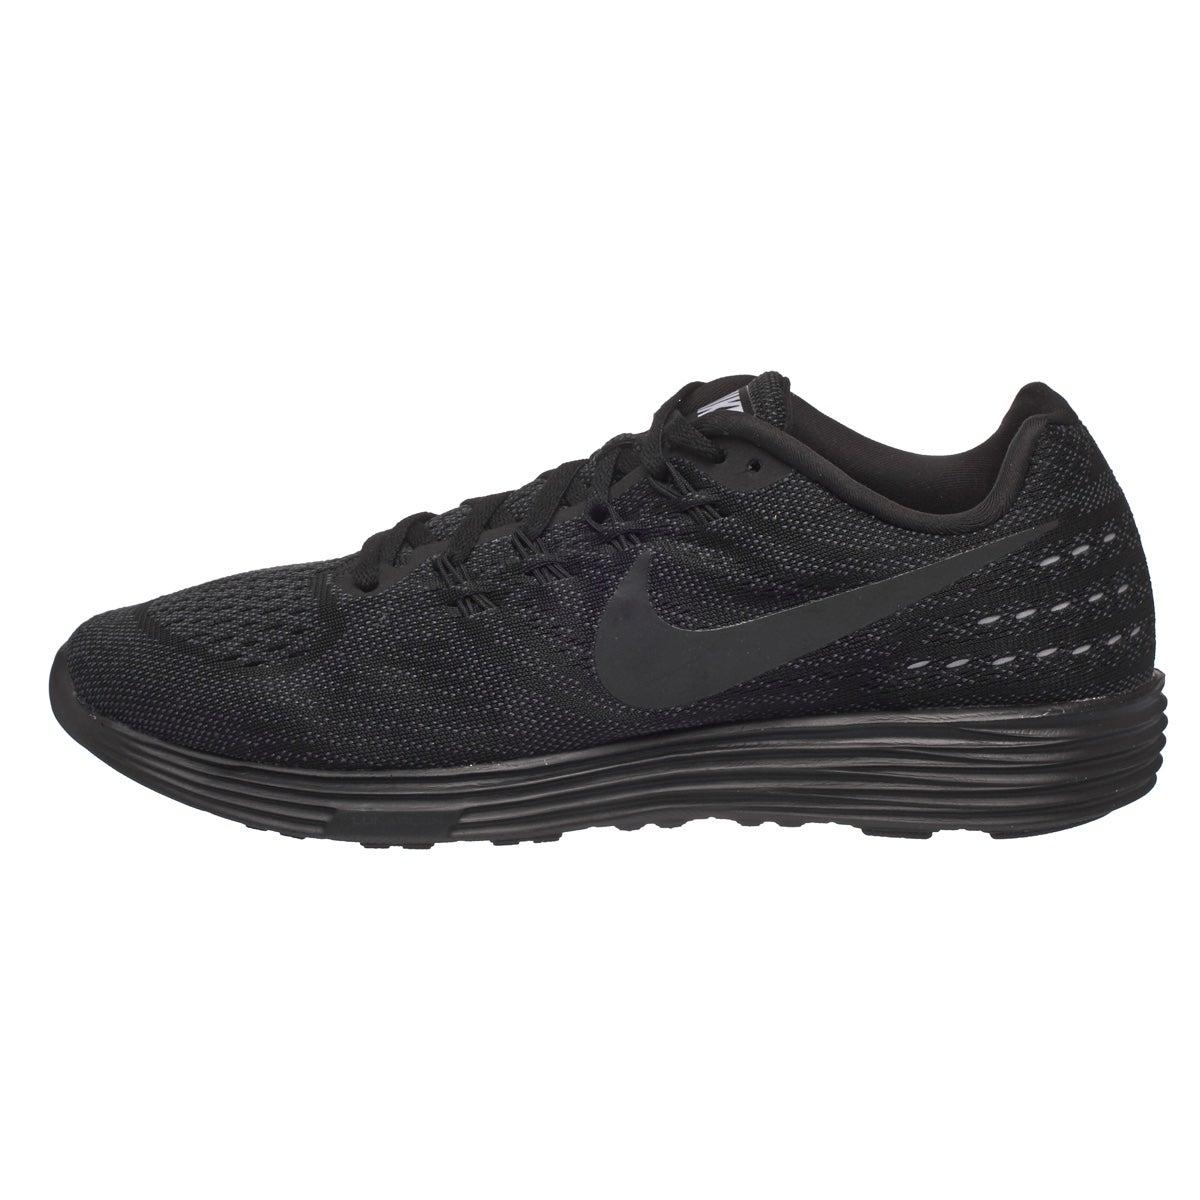 quality design 589e3 51592 Nike LunarTempo 2 Men s Shoes Black 360° View   Running Warehouse Europe.